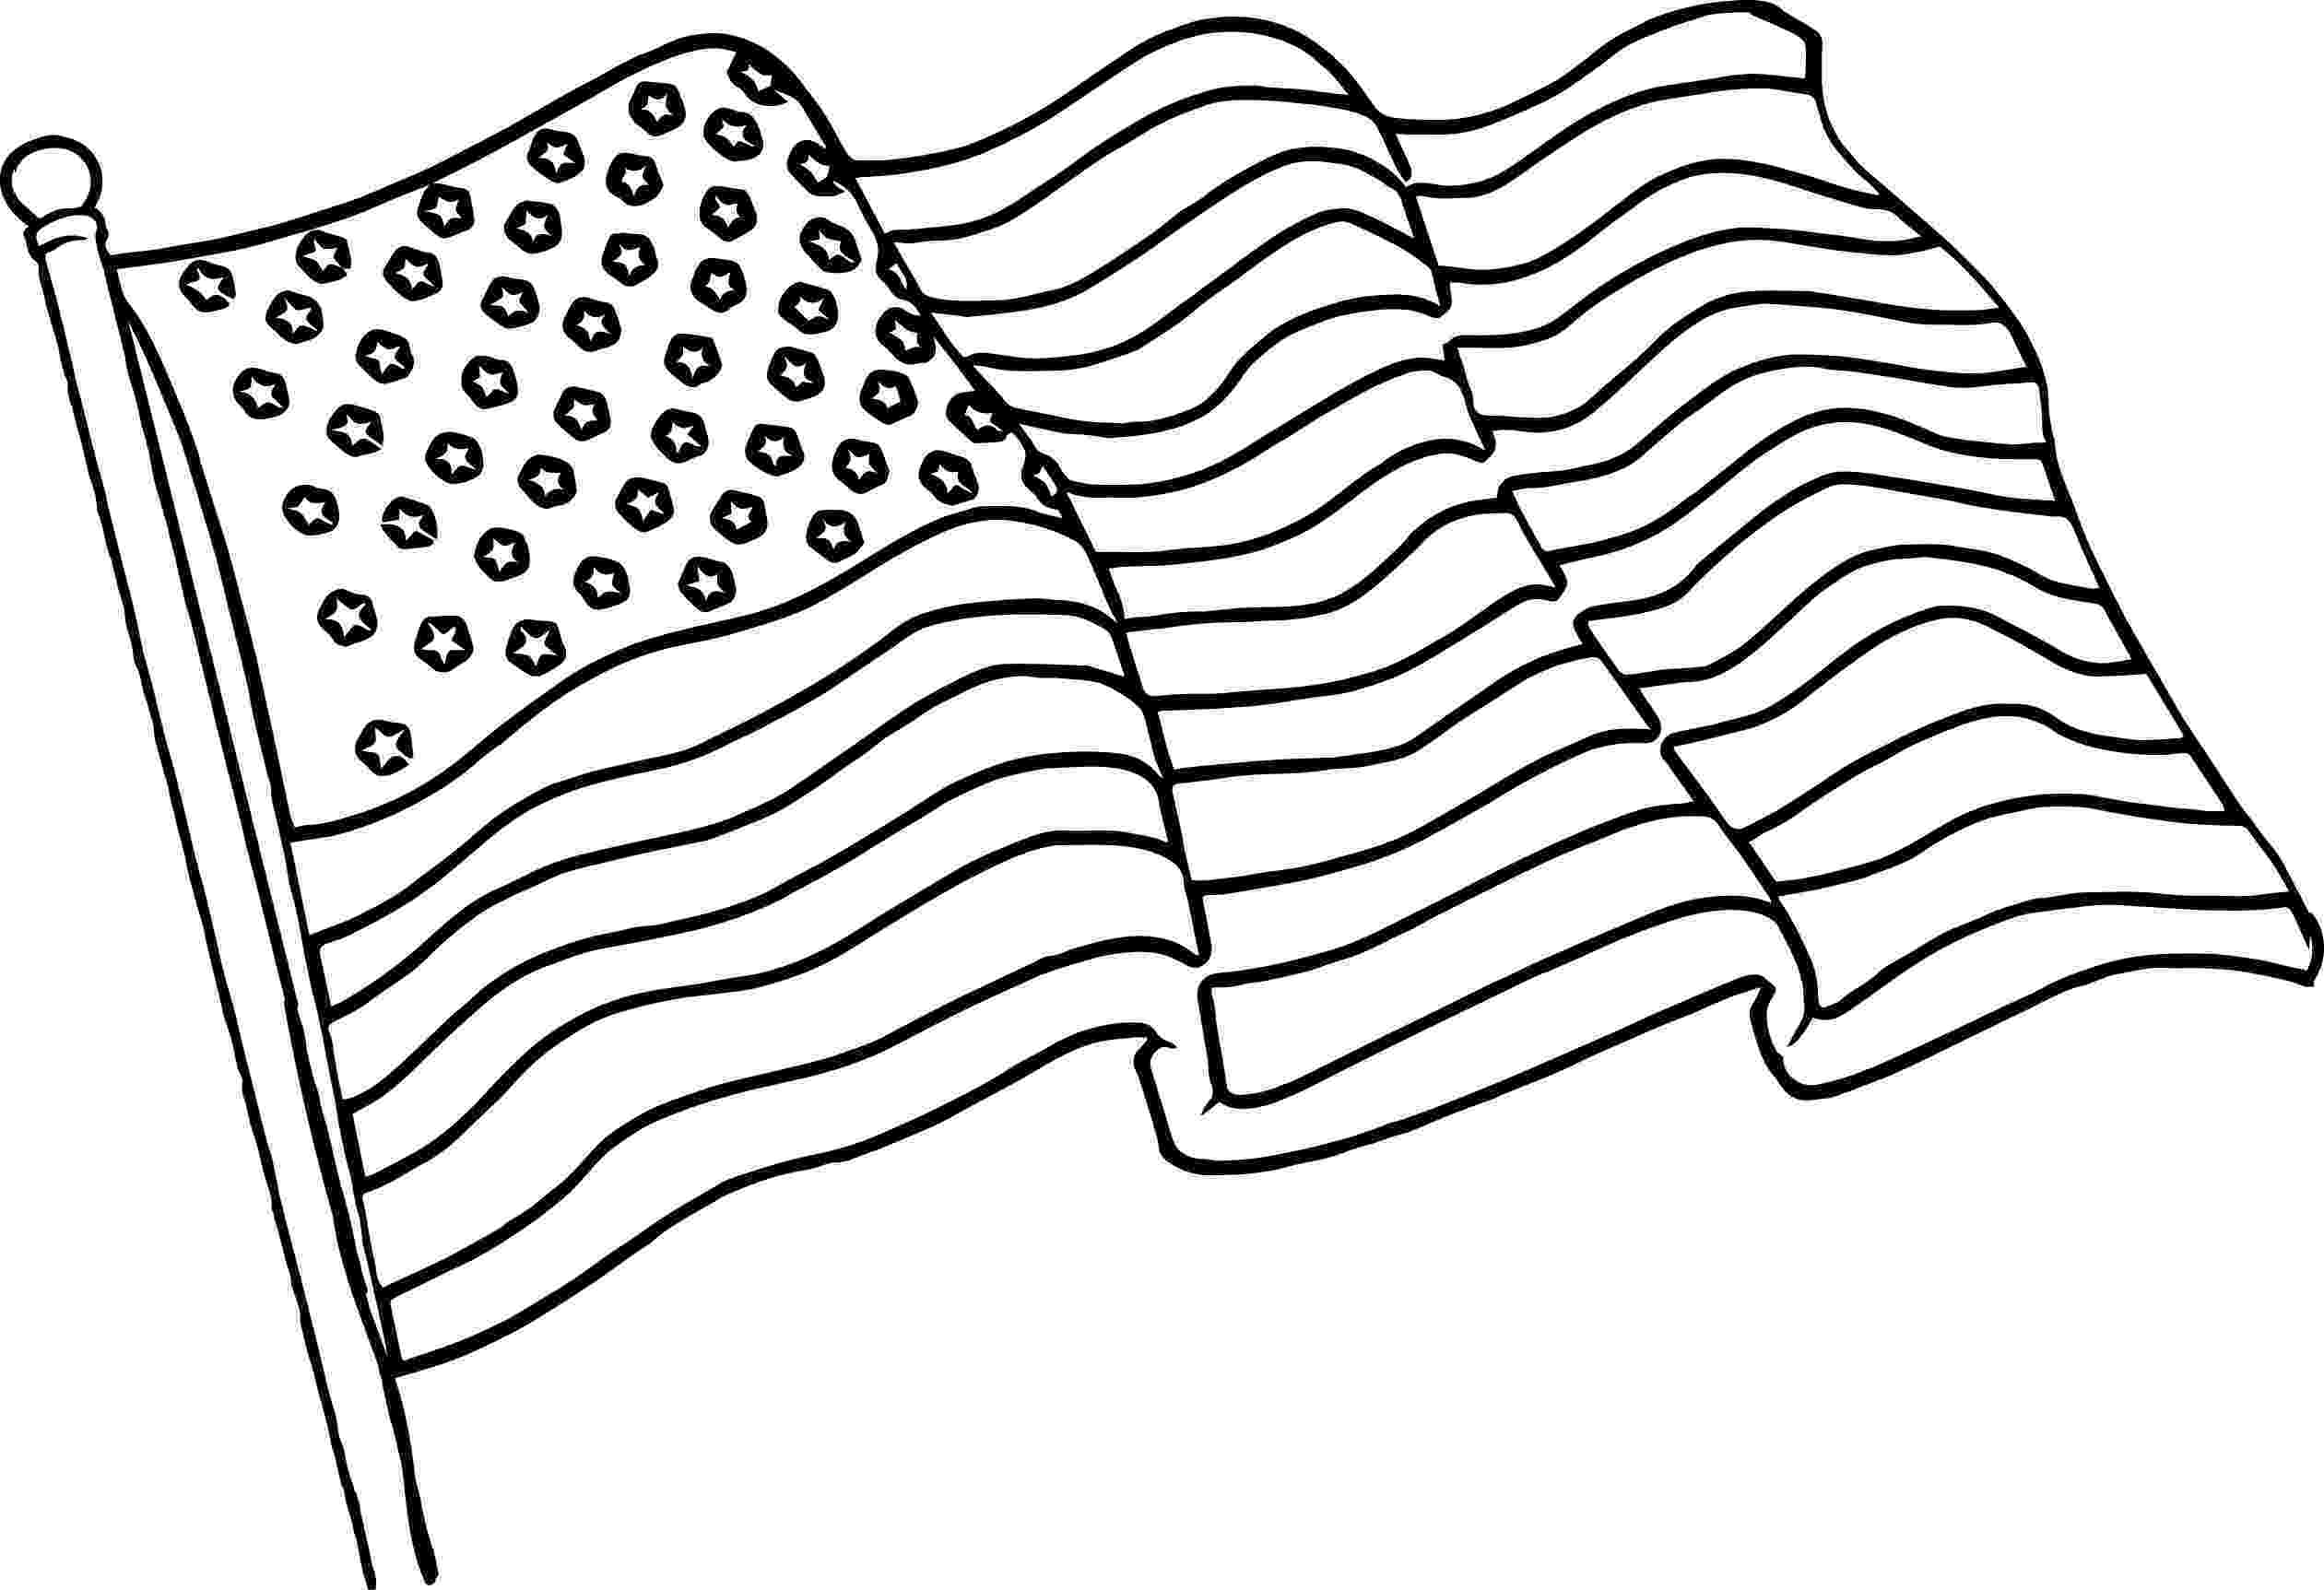 american flag to colour printable flag coloring page line drawing fo an american american flag to colour